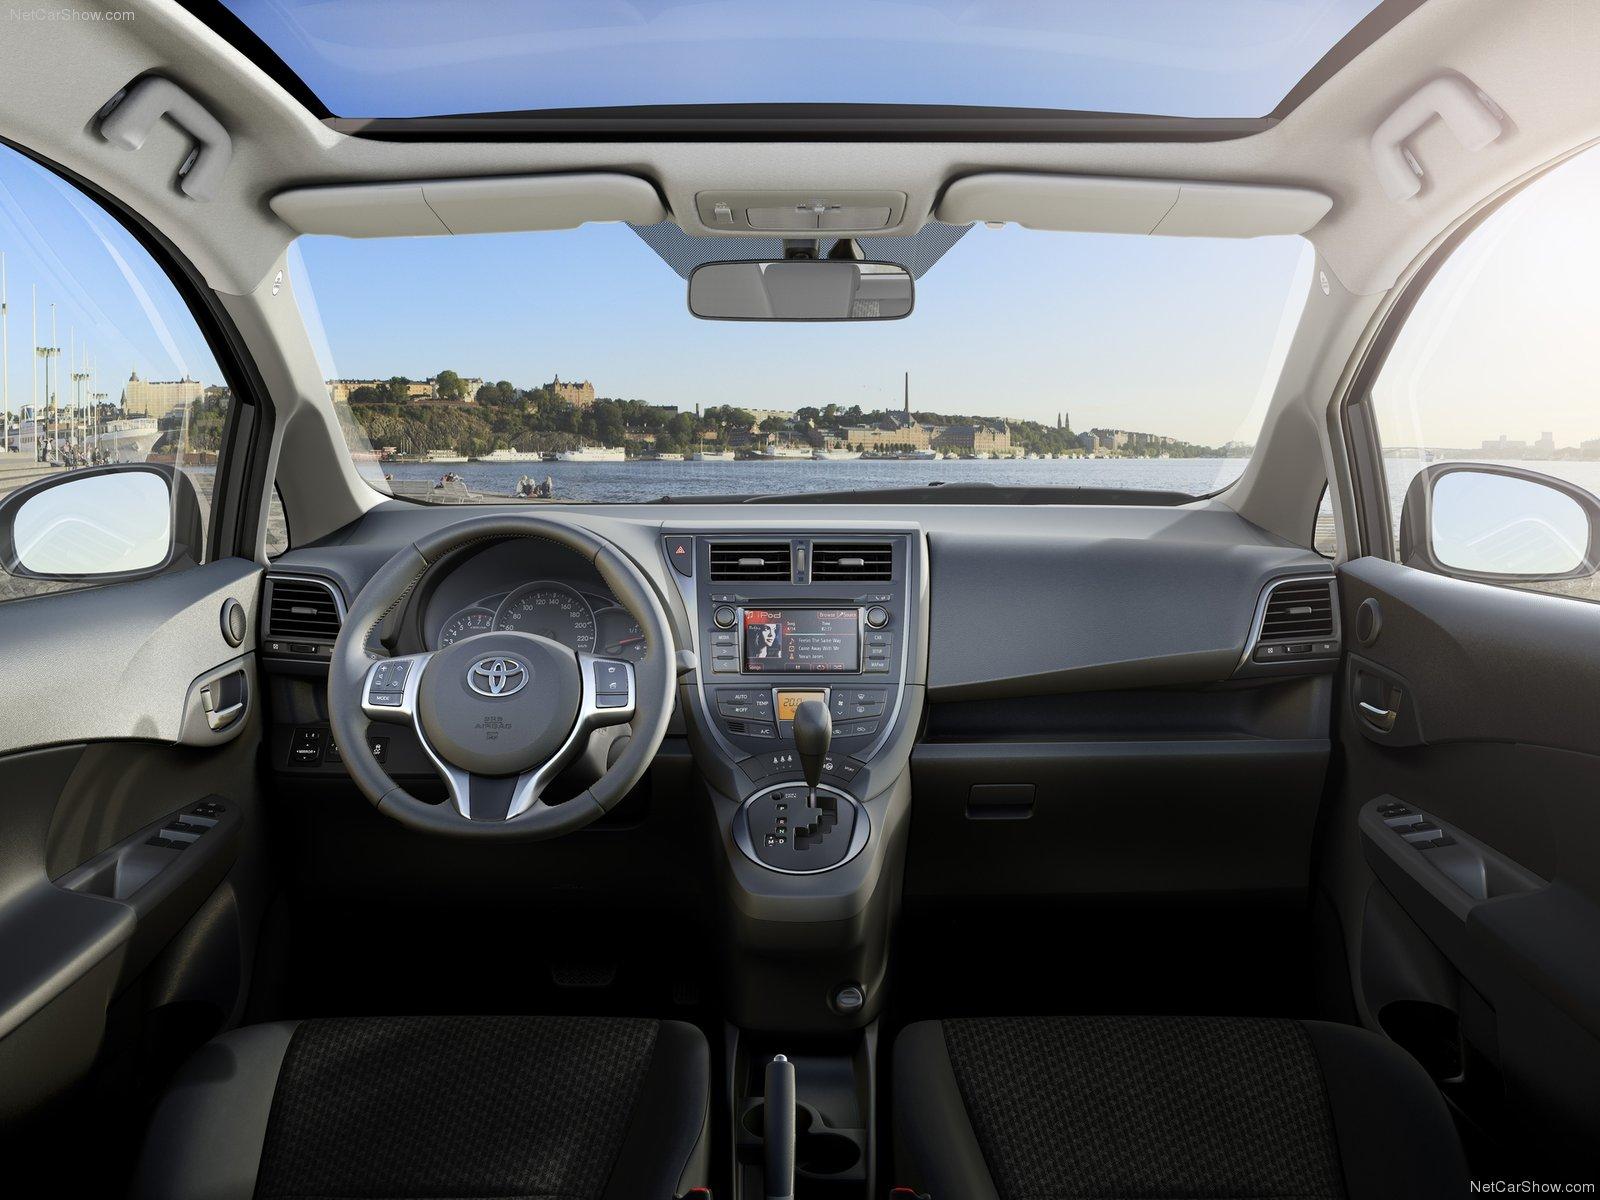 Fahrbericht Toyota Verso-S - autobild.de